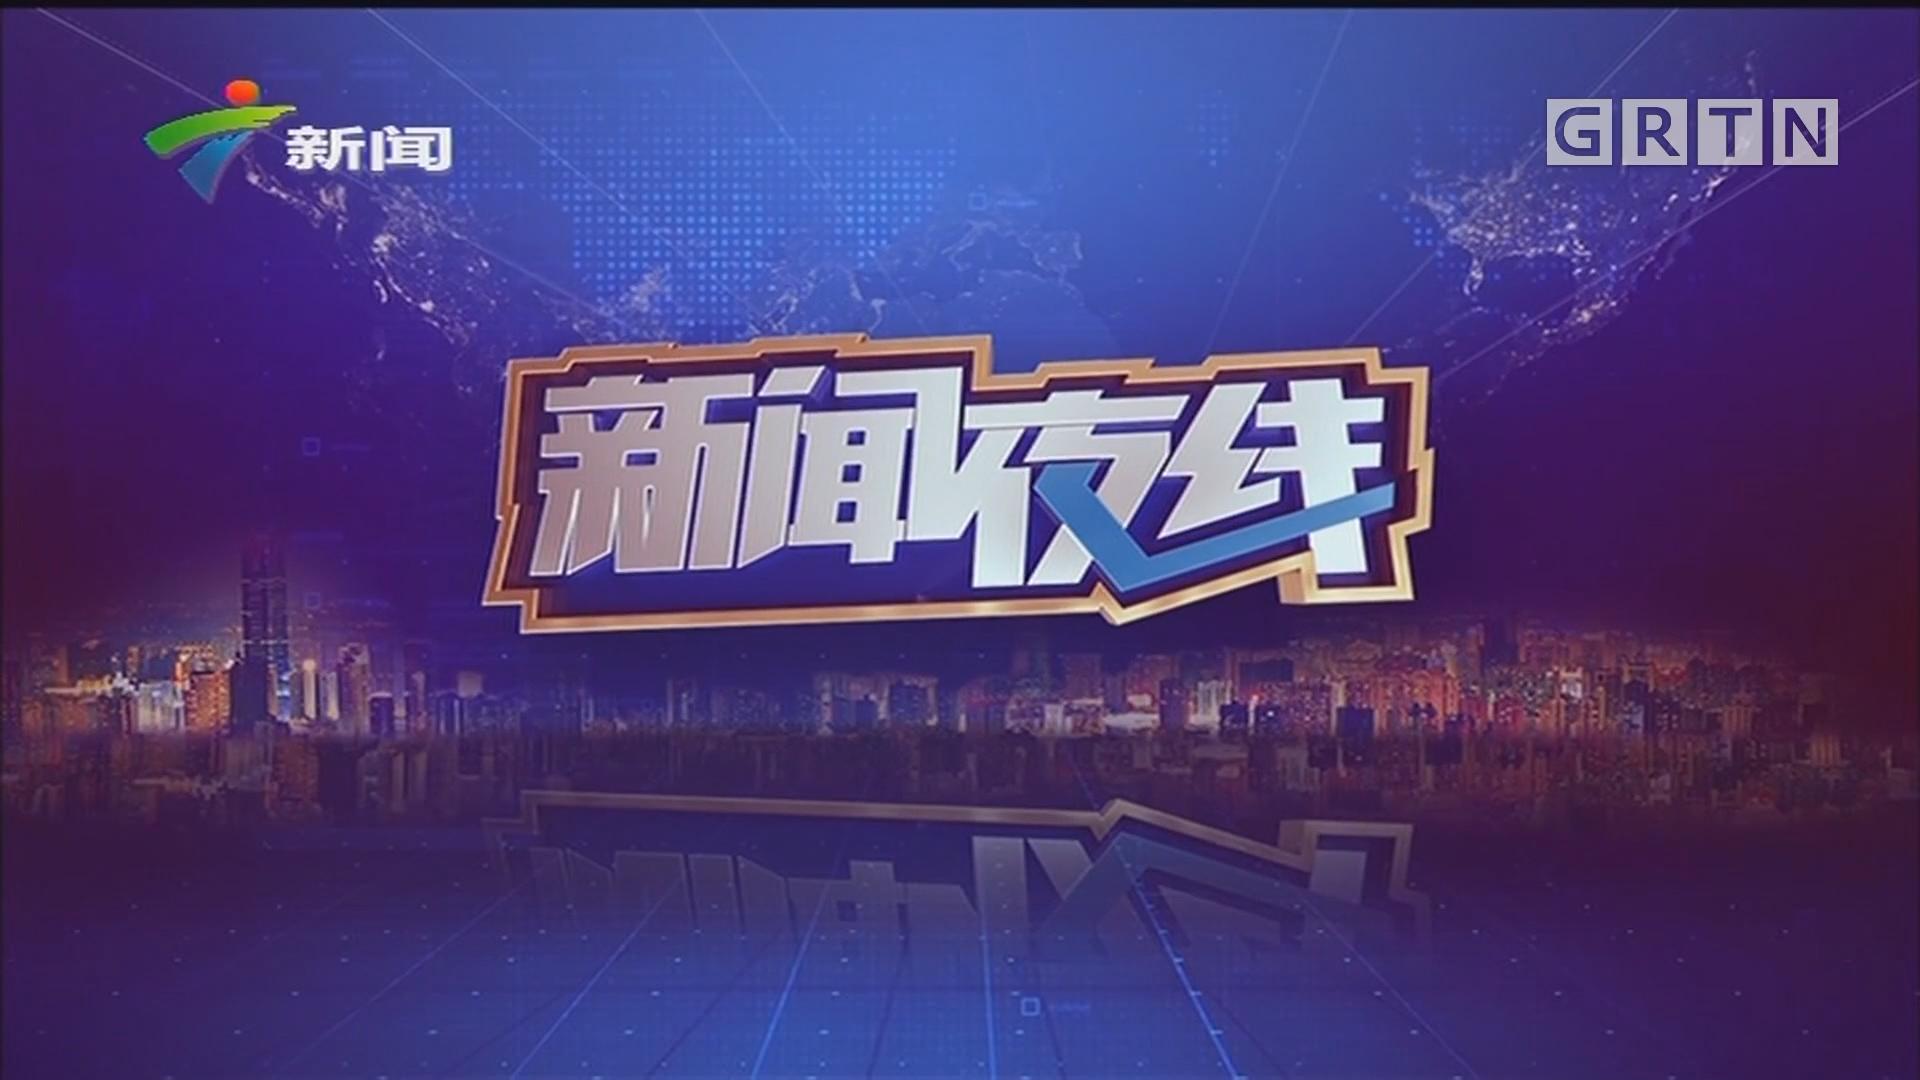 [HD][2019-10-14]新闻夜线:《中国的粮食安全》白皮书发表